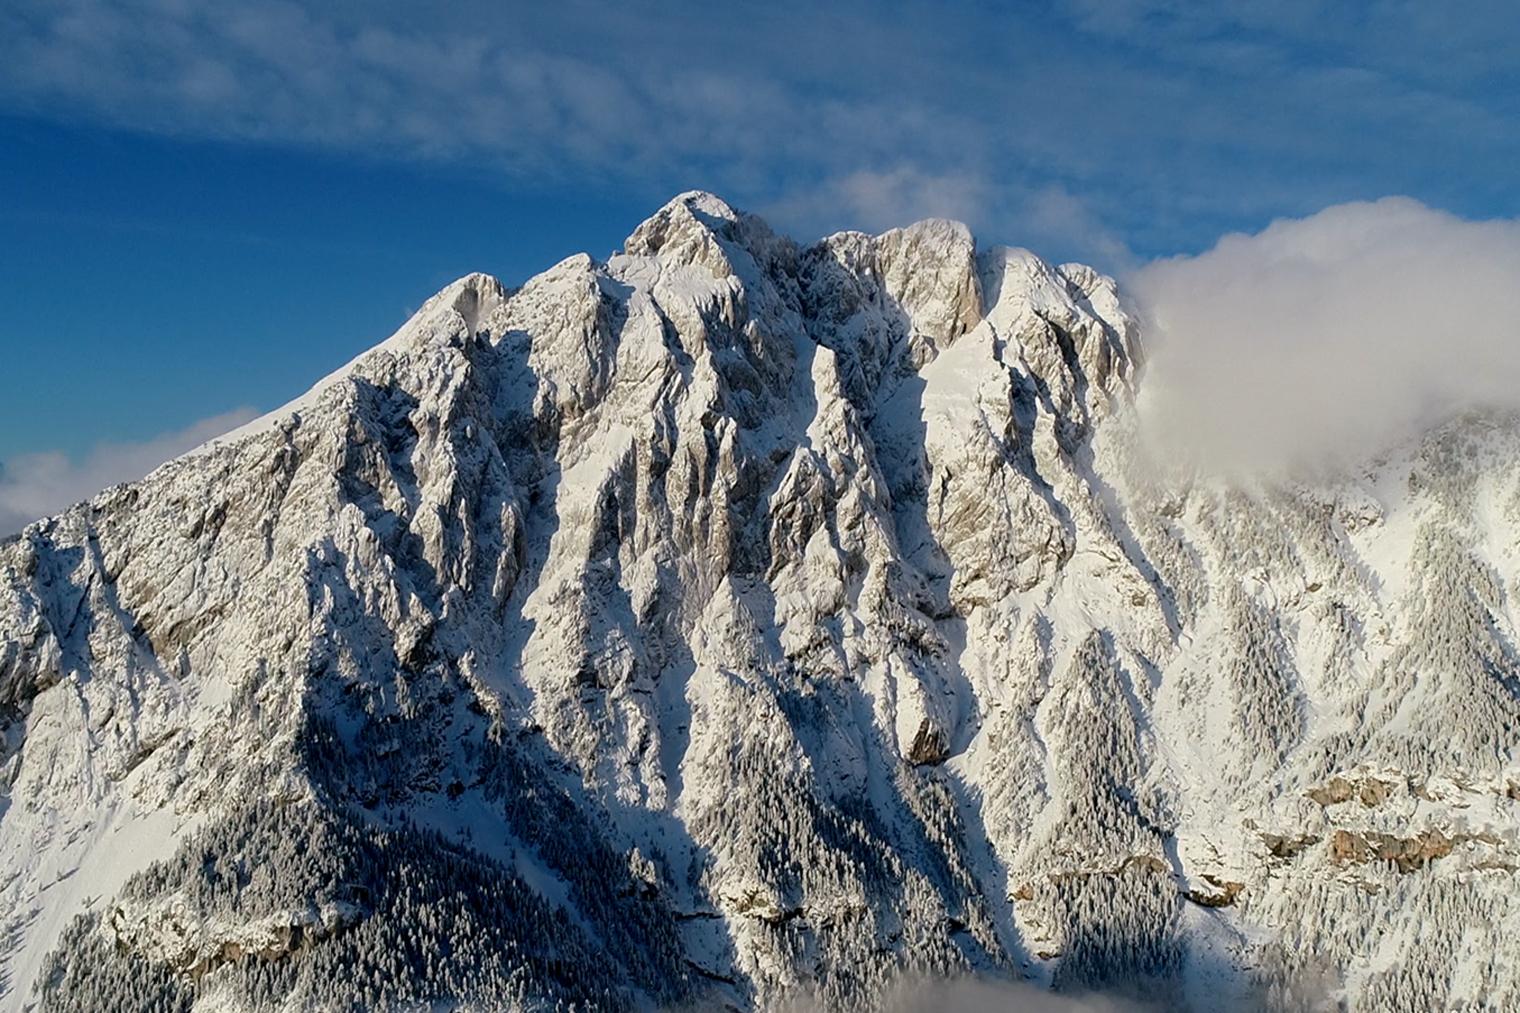 Sierra del Cadí nevada